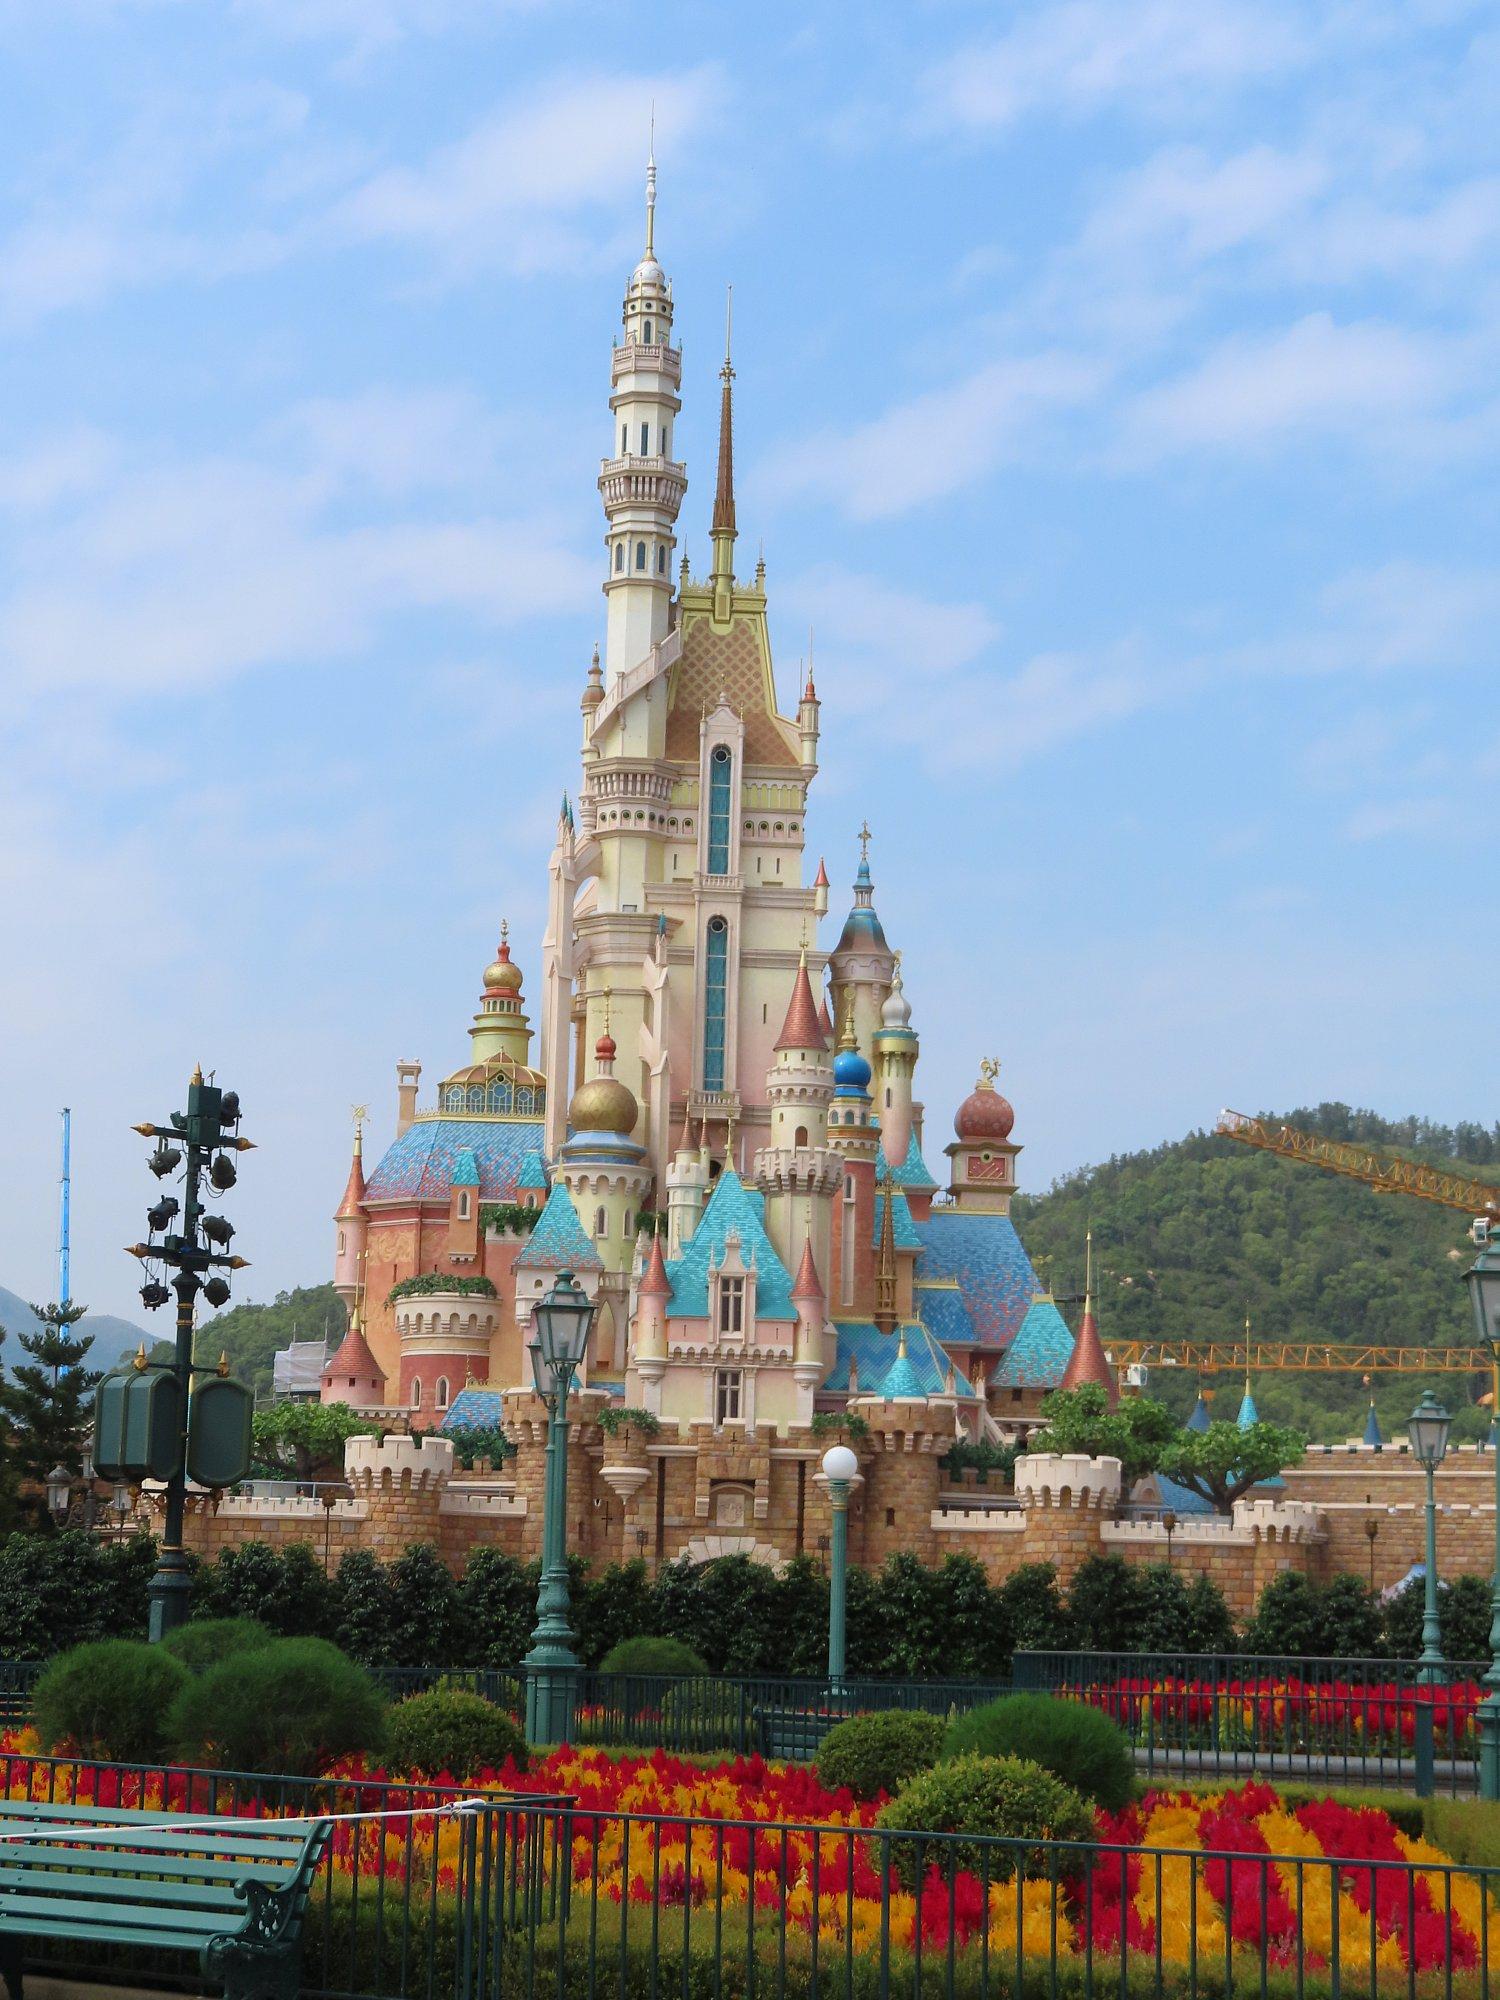 Disneyland Rides List 2021 Printable